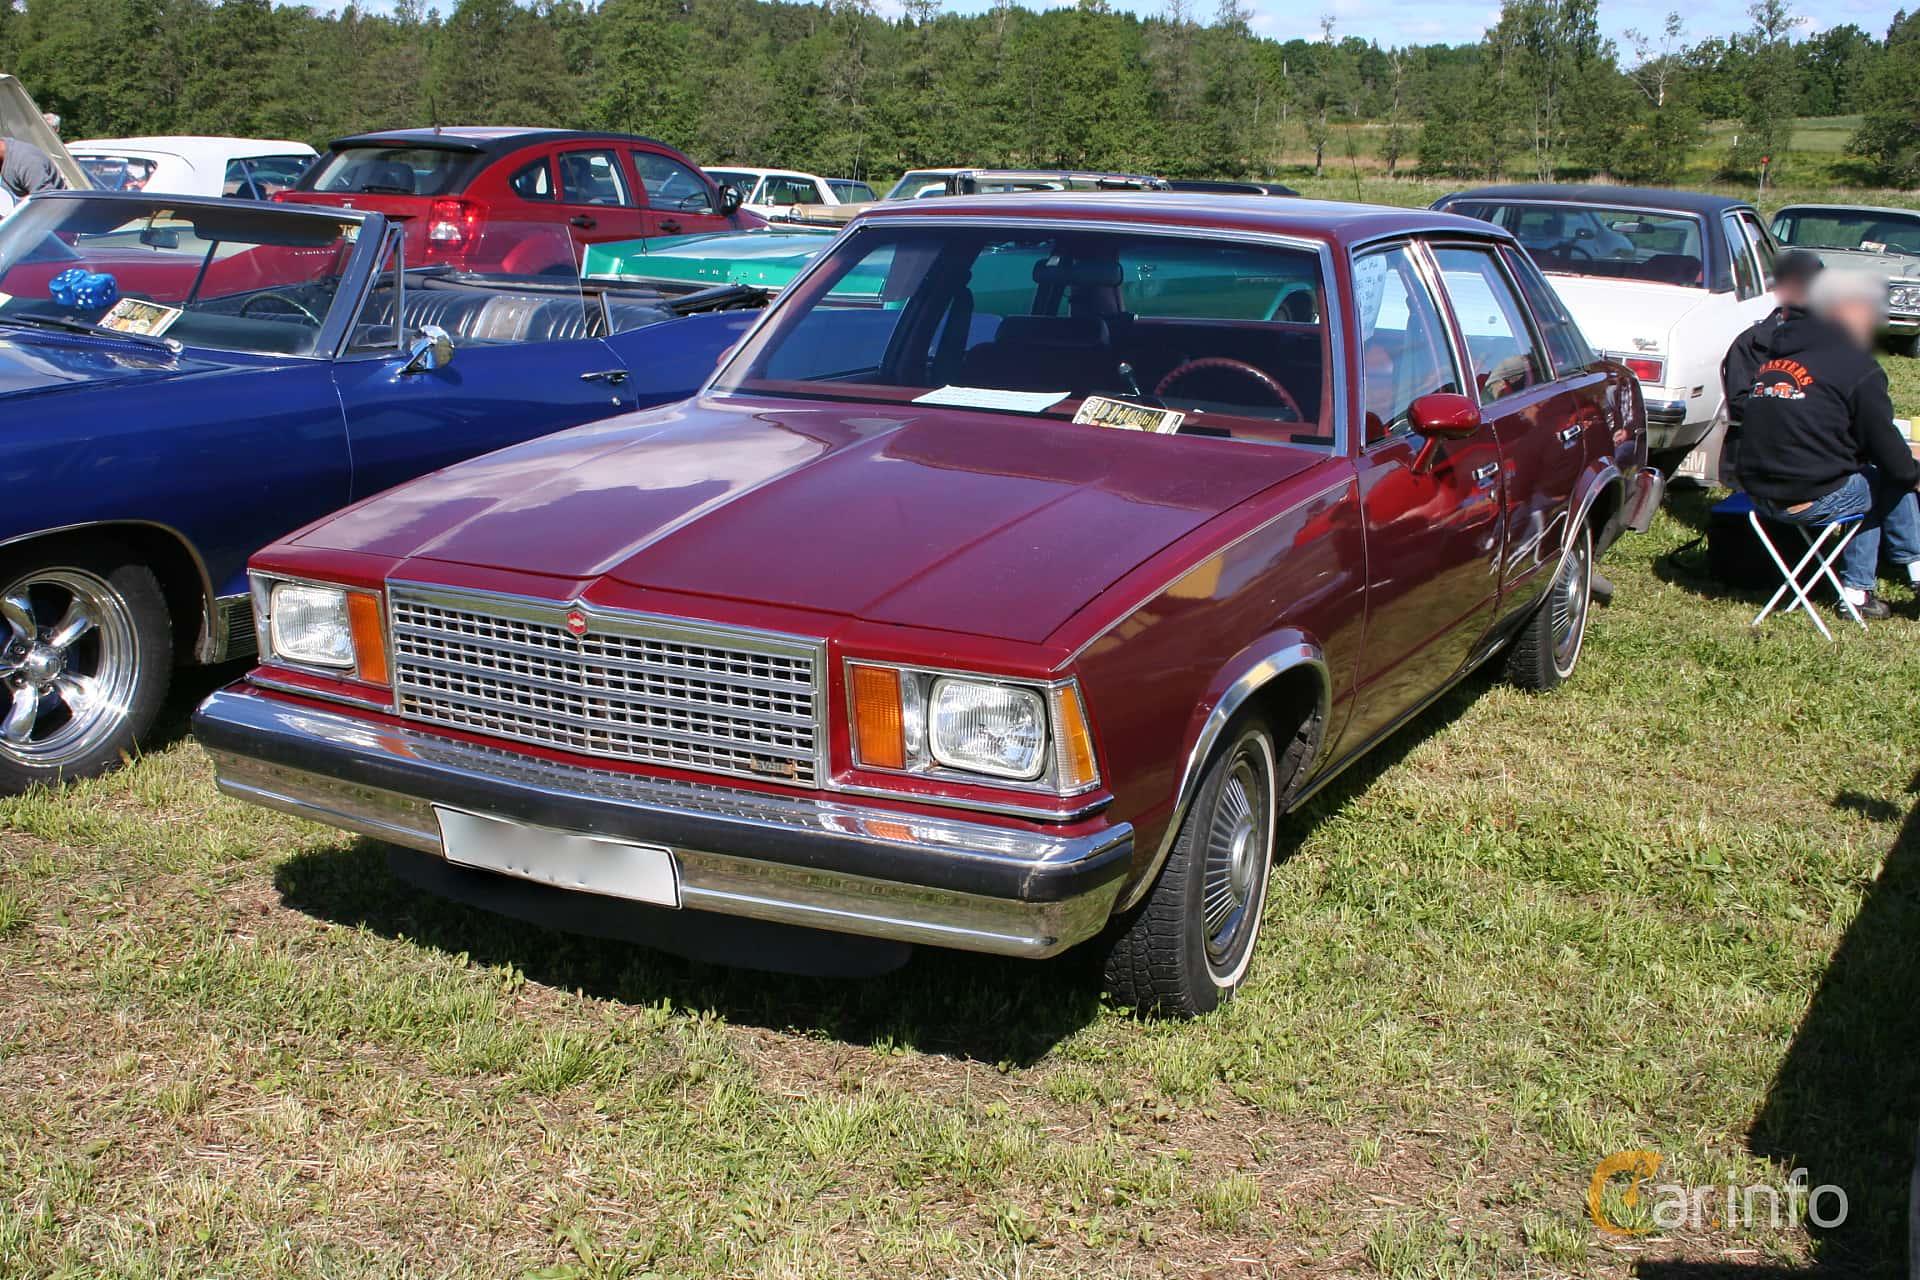 Chevrolet Malibu 5.0 V8 Automatic, 162hp, 1979 at Power America Fest, Nossebro 2012